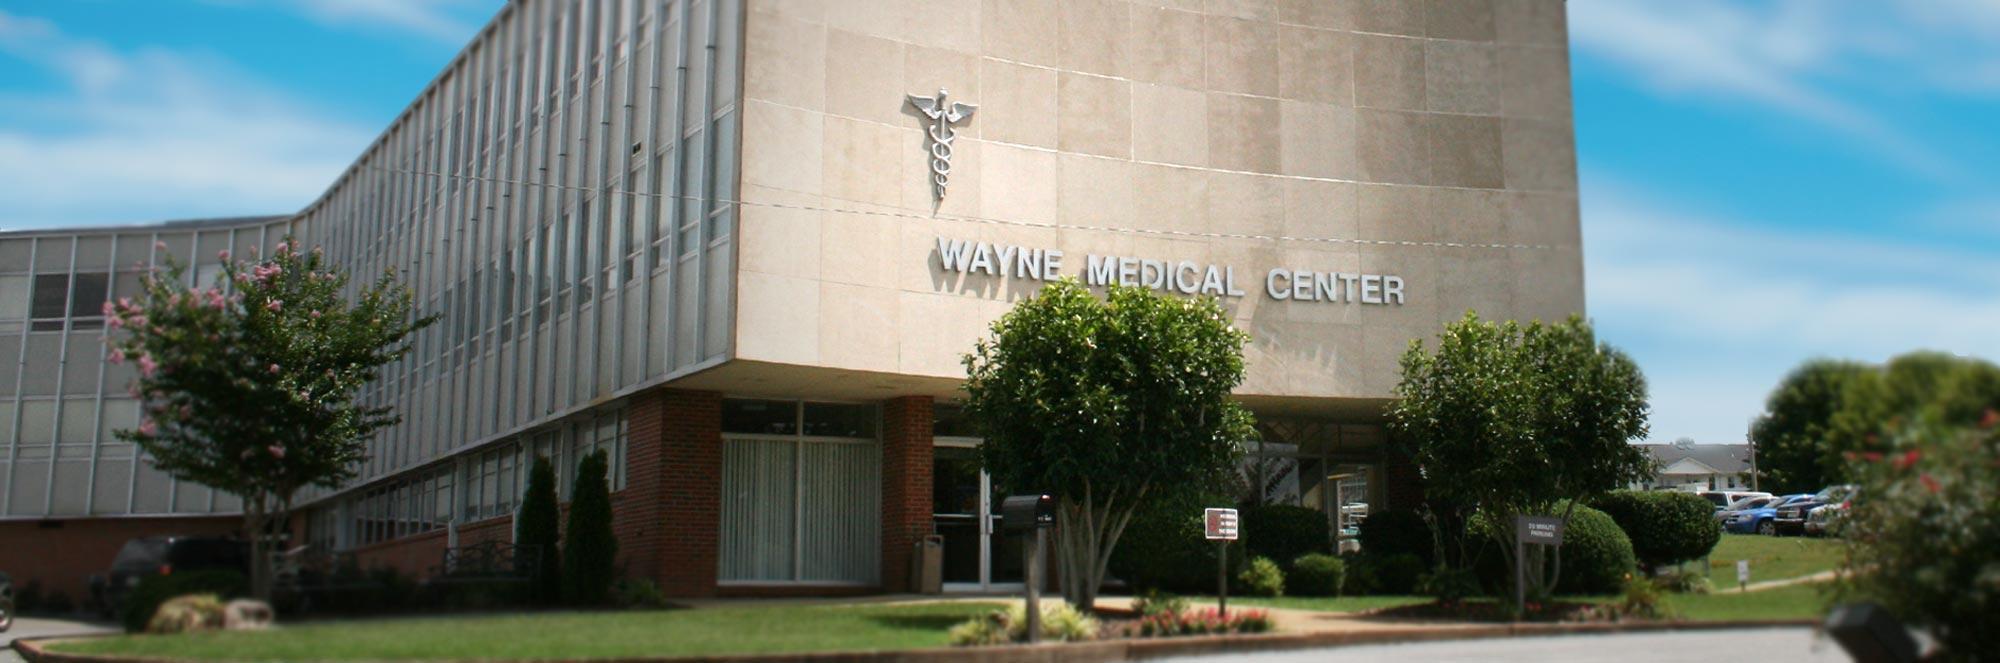 Wayne Medical Center image 0